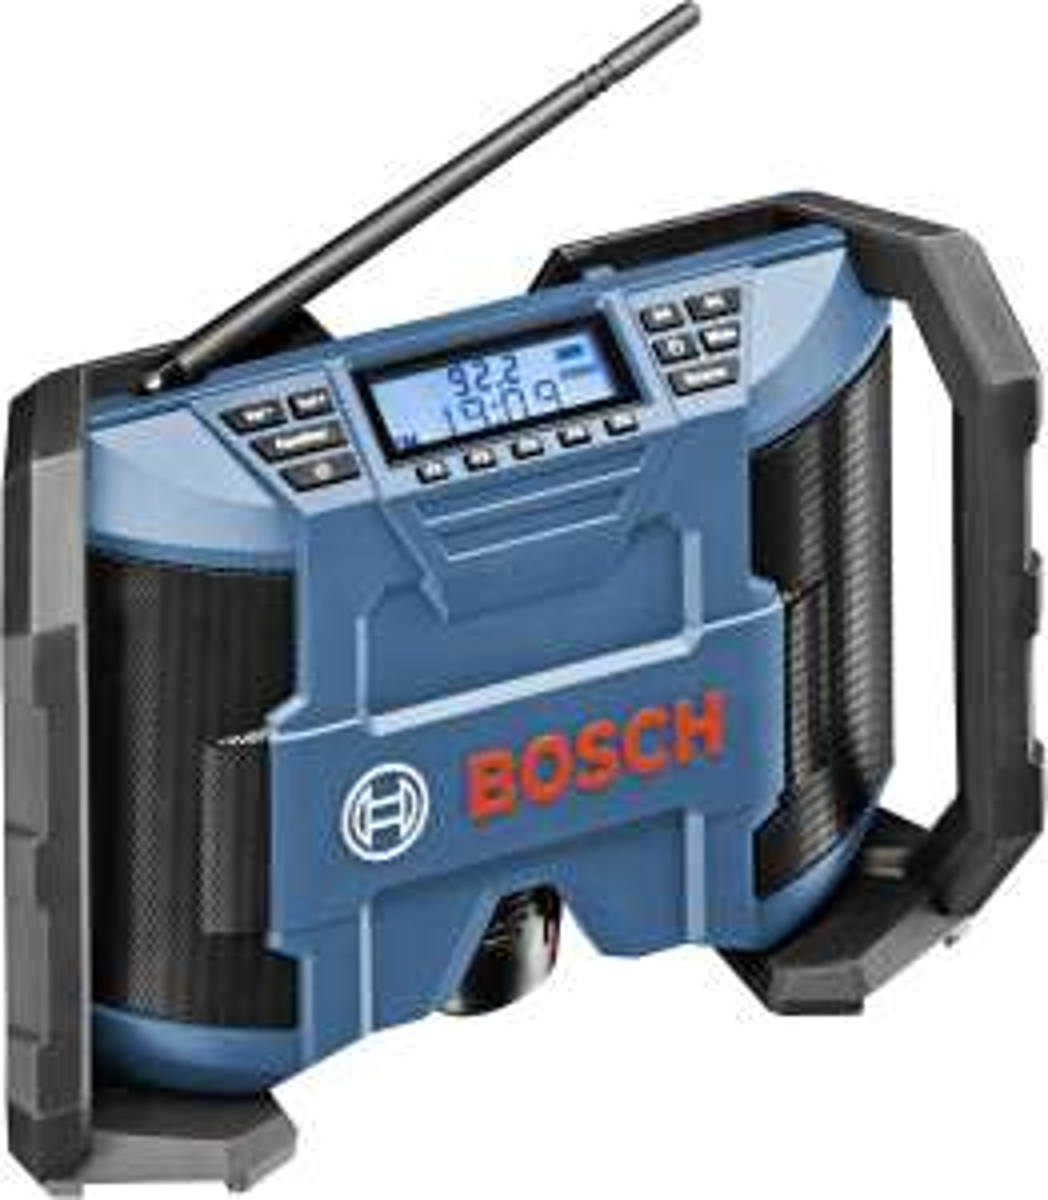 Bosch GPB 12V-10 Professional Radio